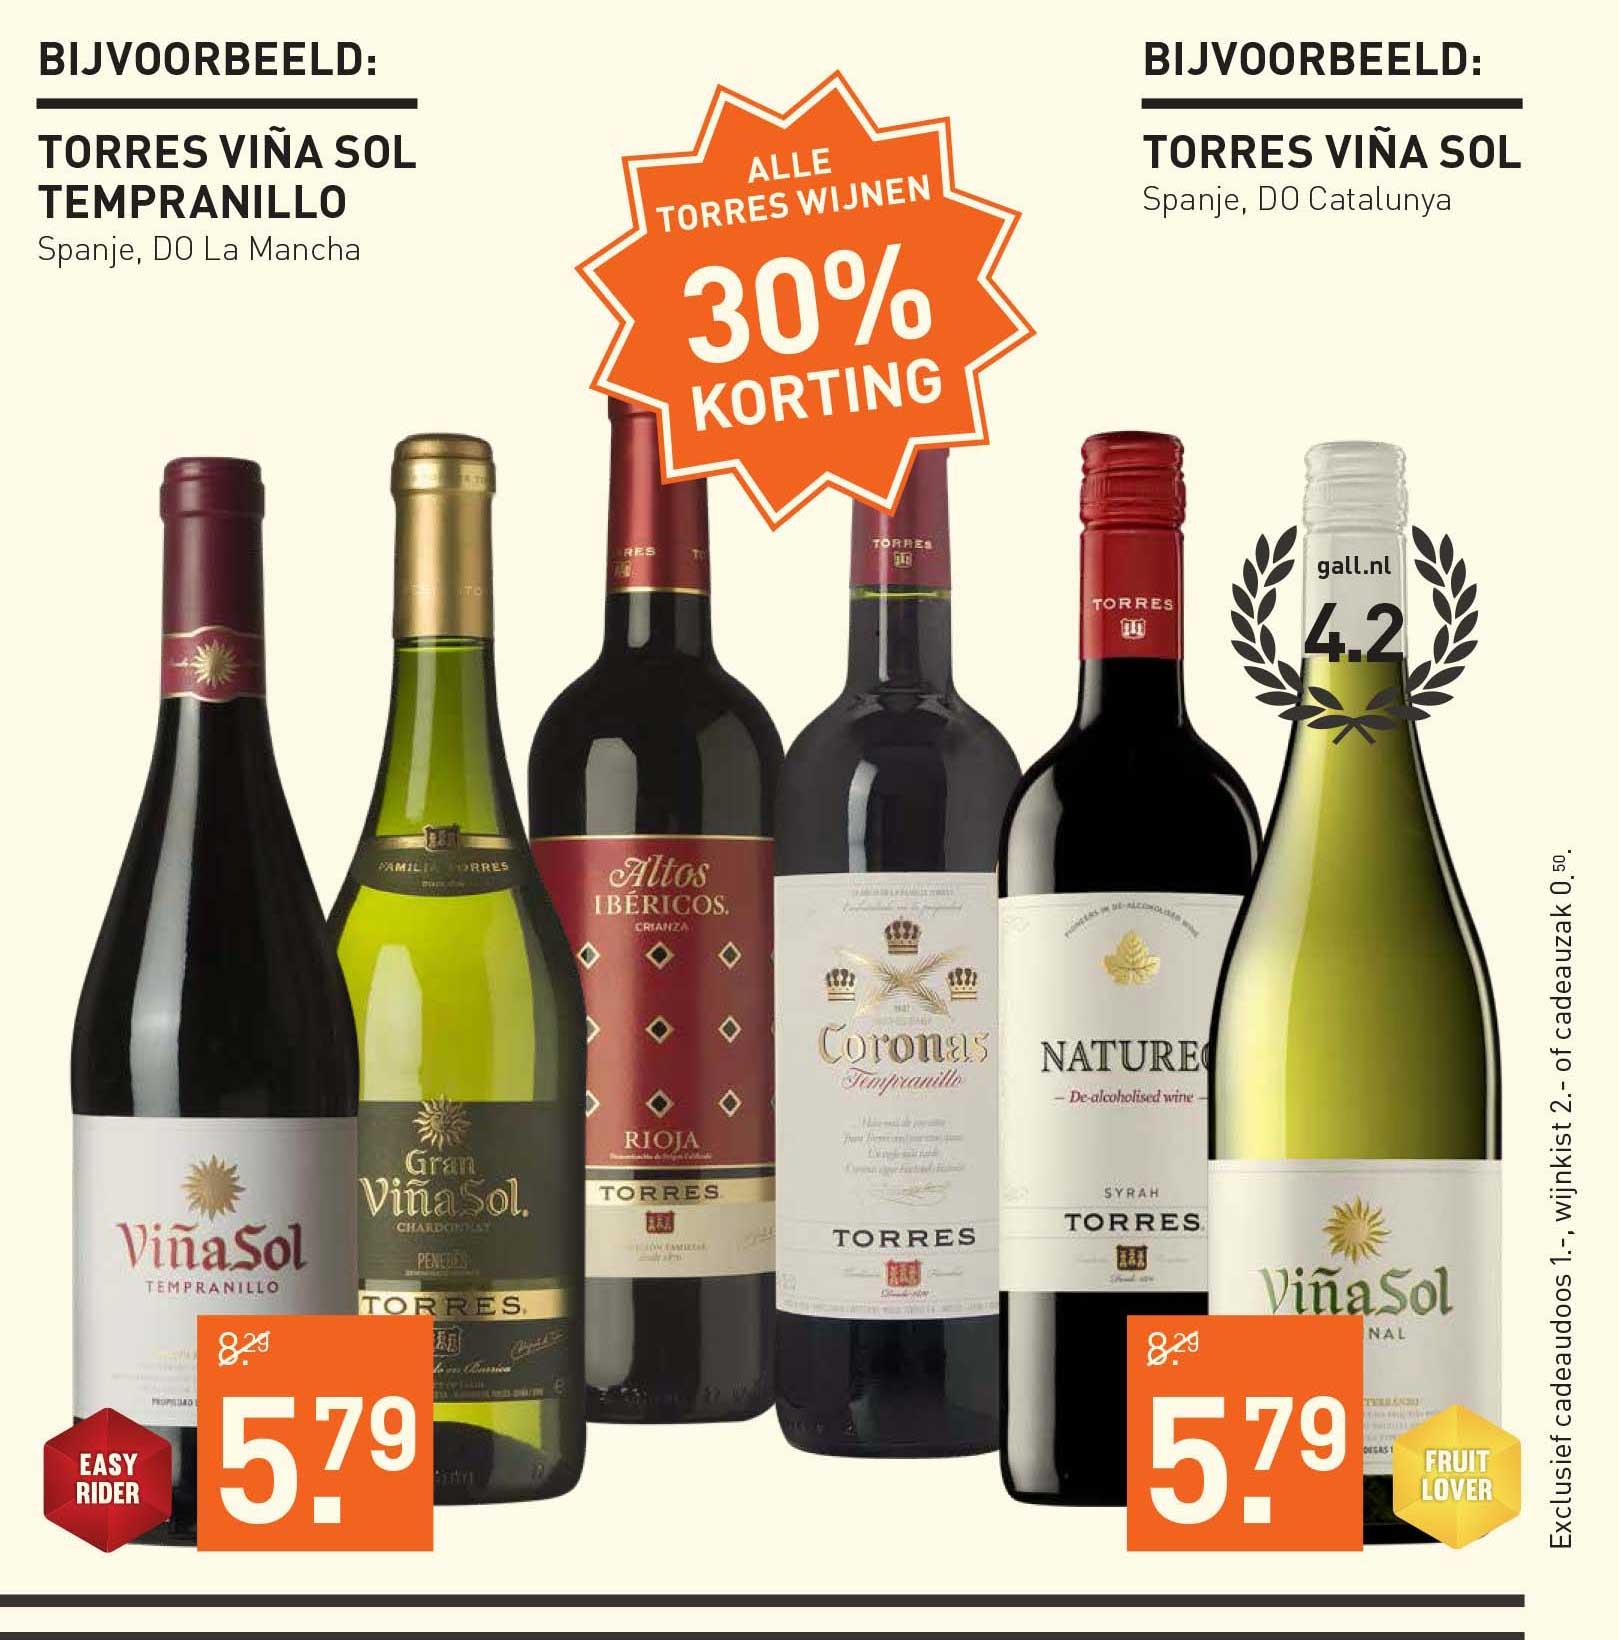 Gall & Gall Alle Torres Wijnen: 30% Korting